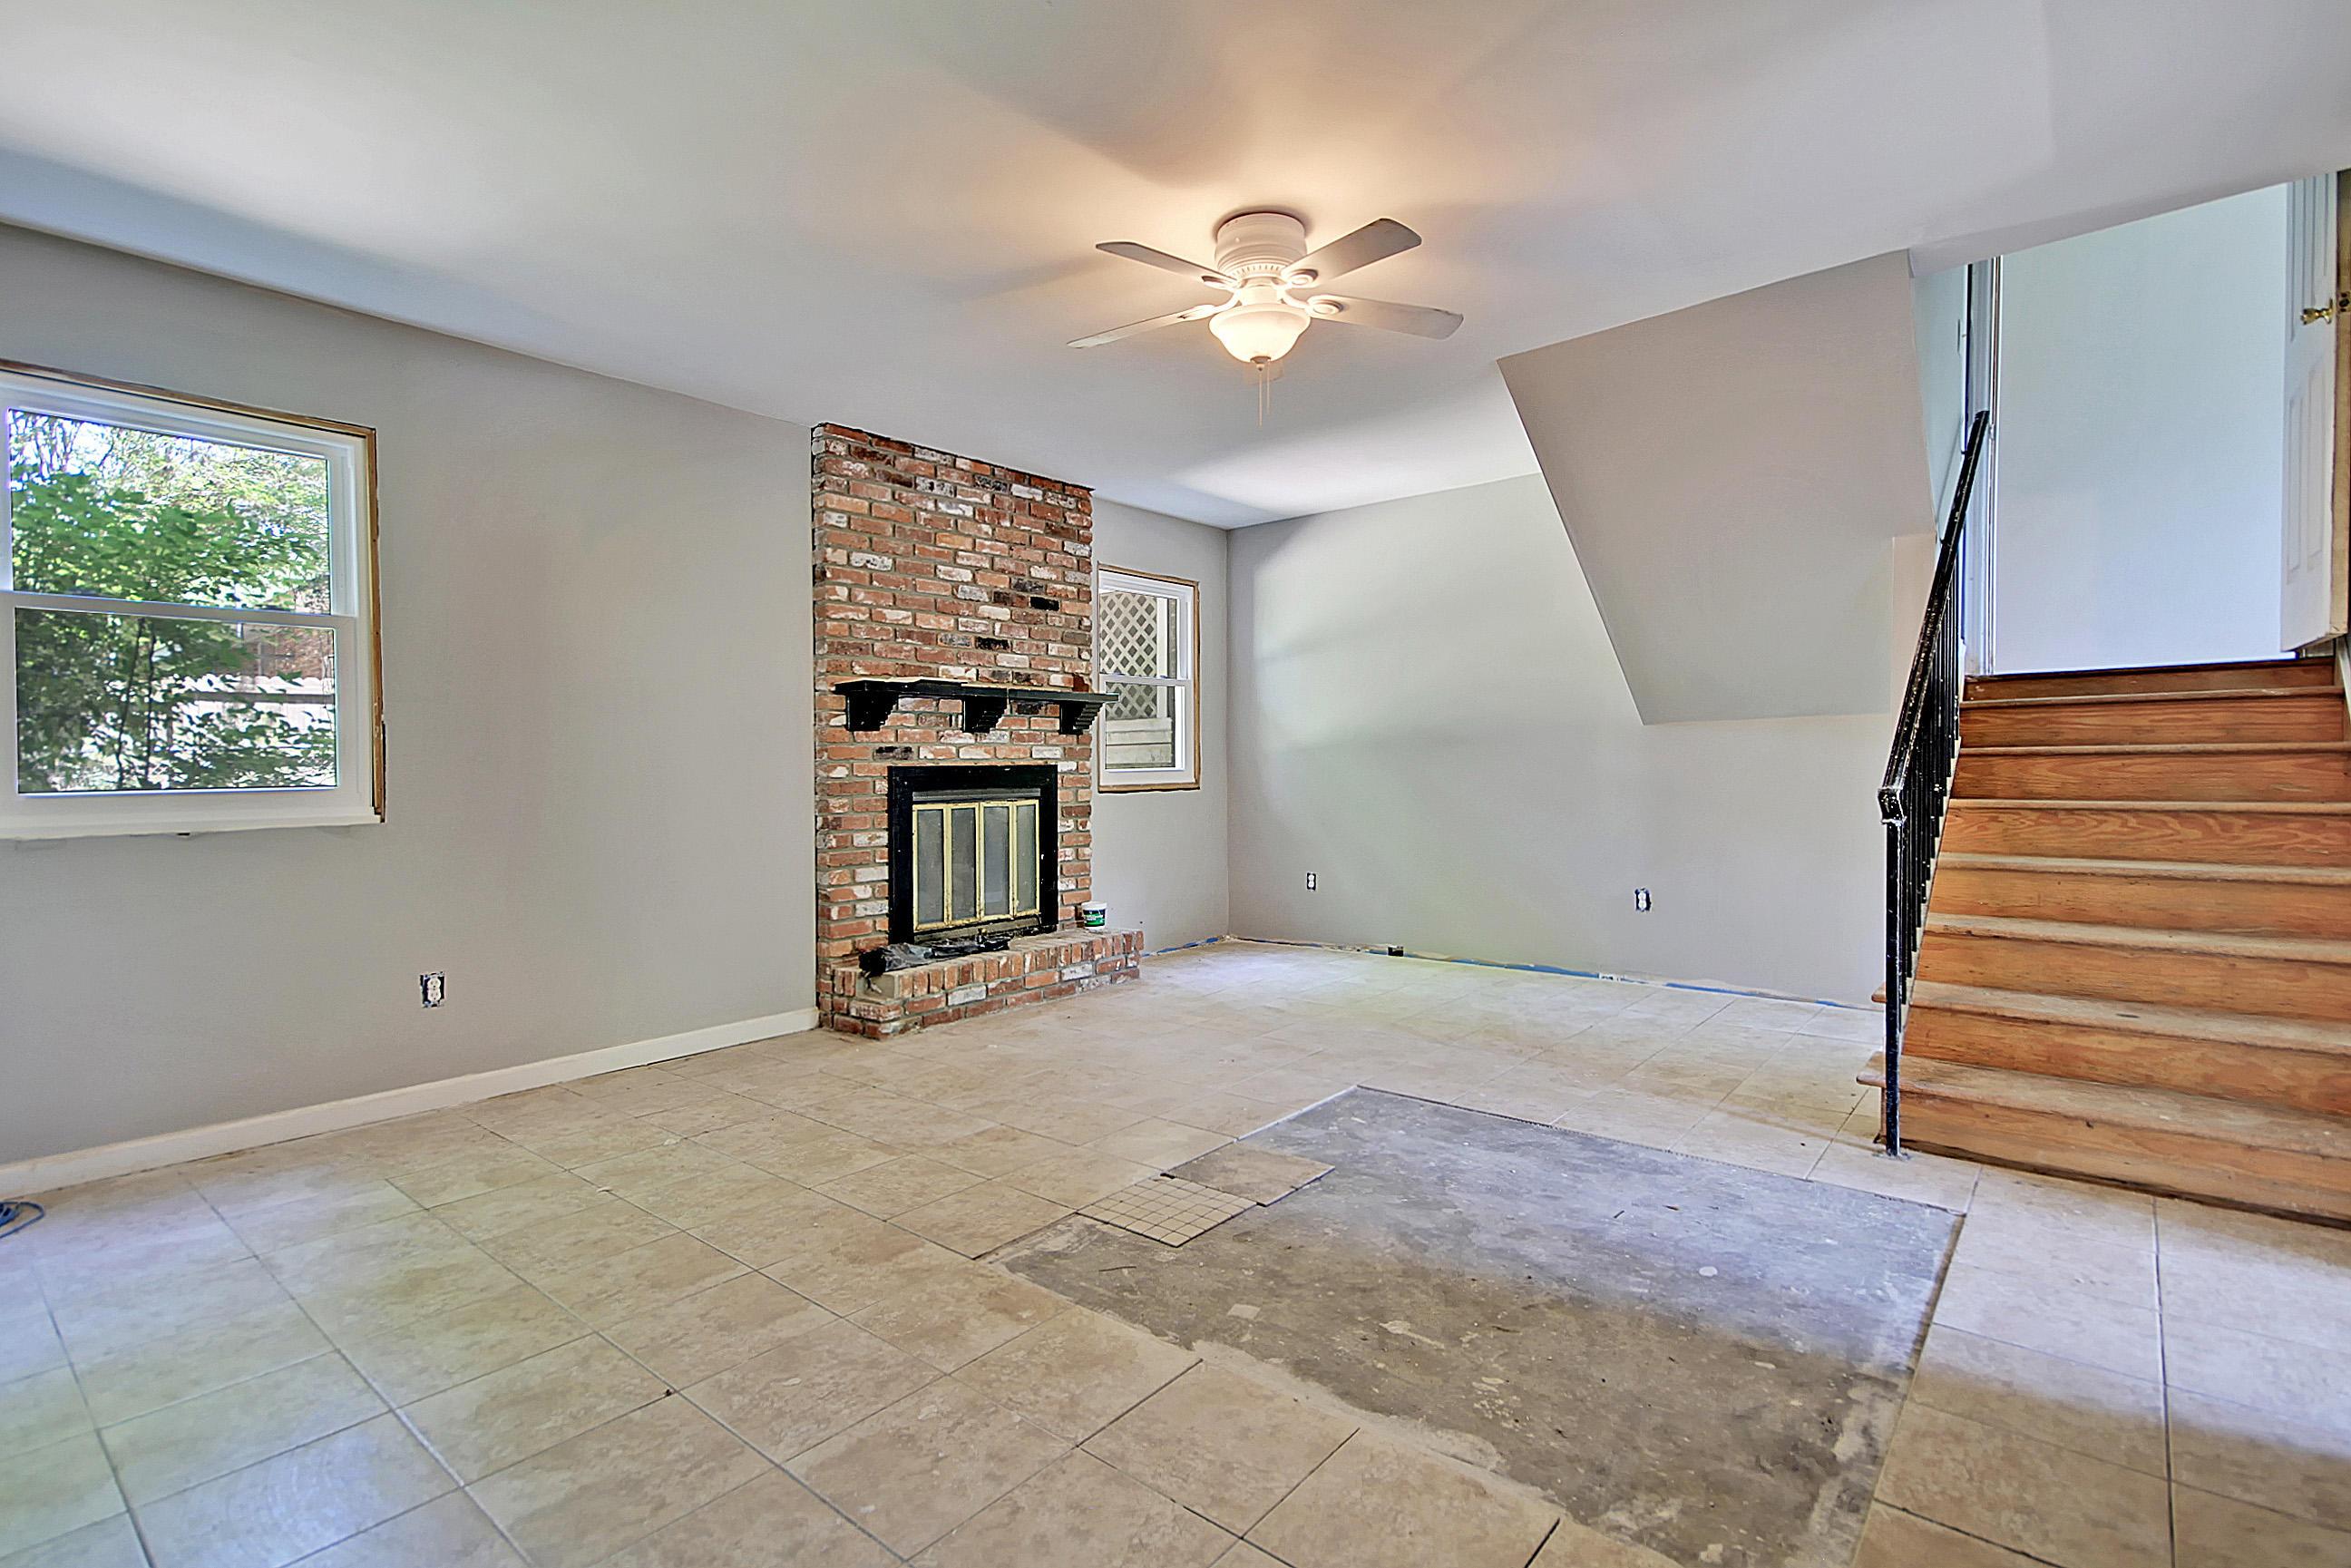 Northbridge Terrace Homes For Sale - 1094 Northbridge, Charleston, SC - 28